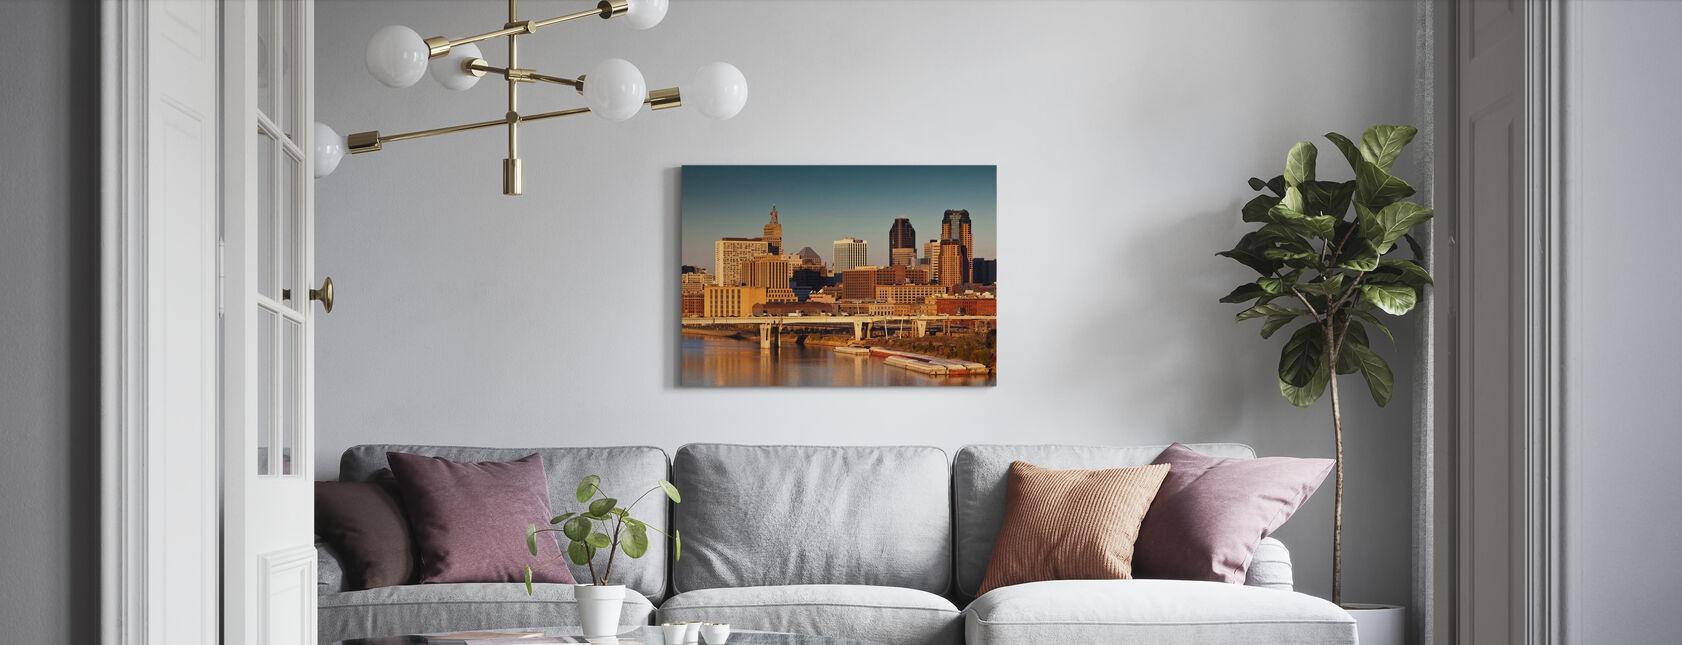 Zonsopgang in Minneapolis - Canvas print - Woonkamer